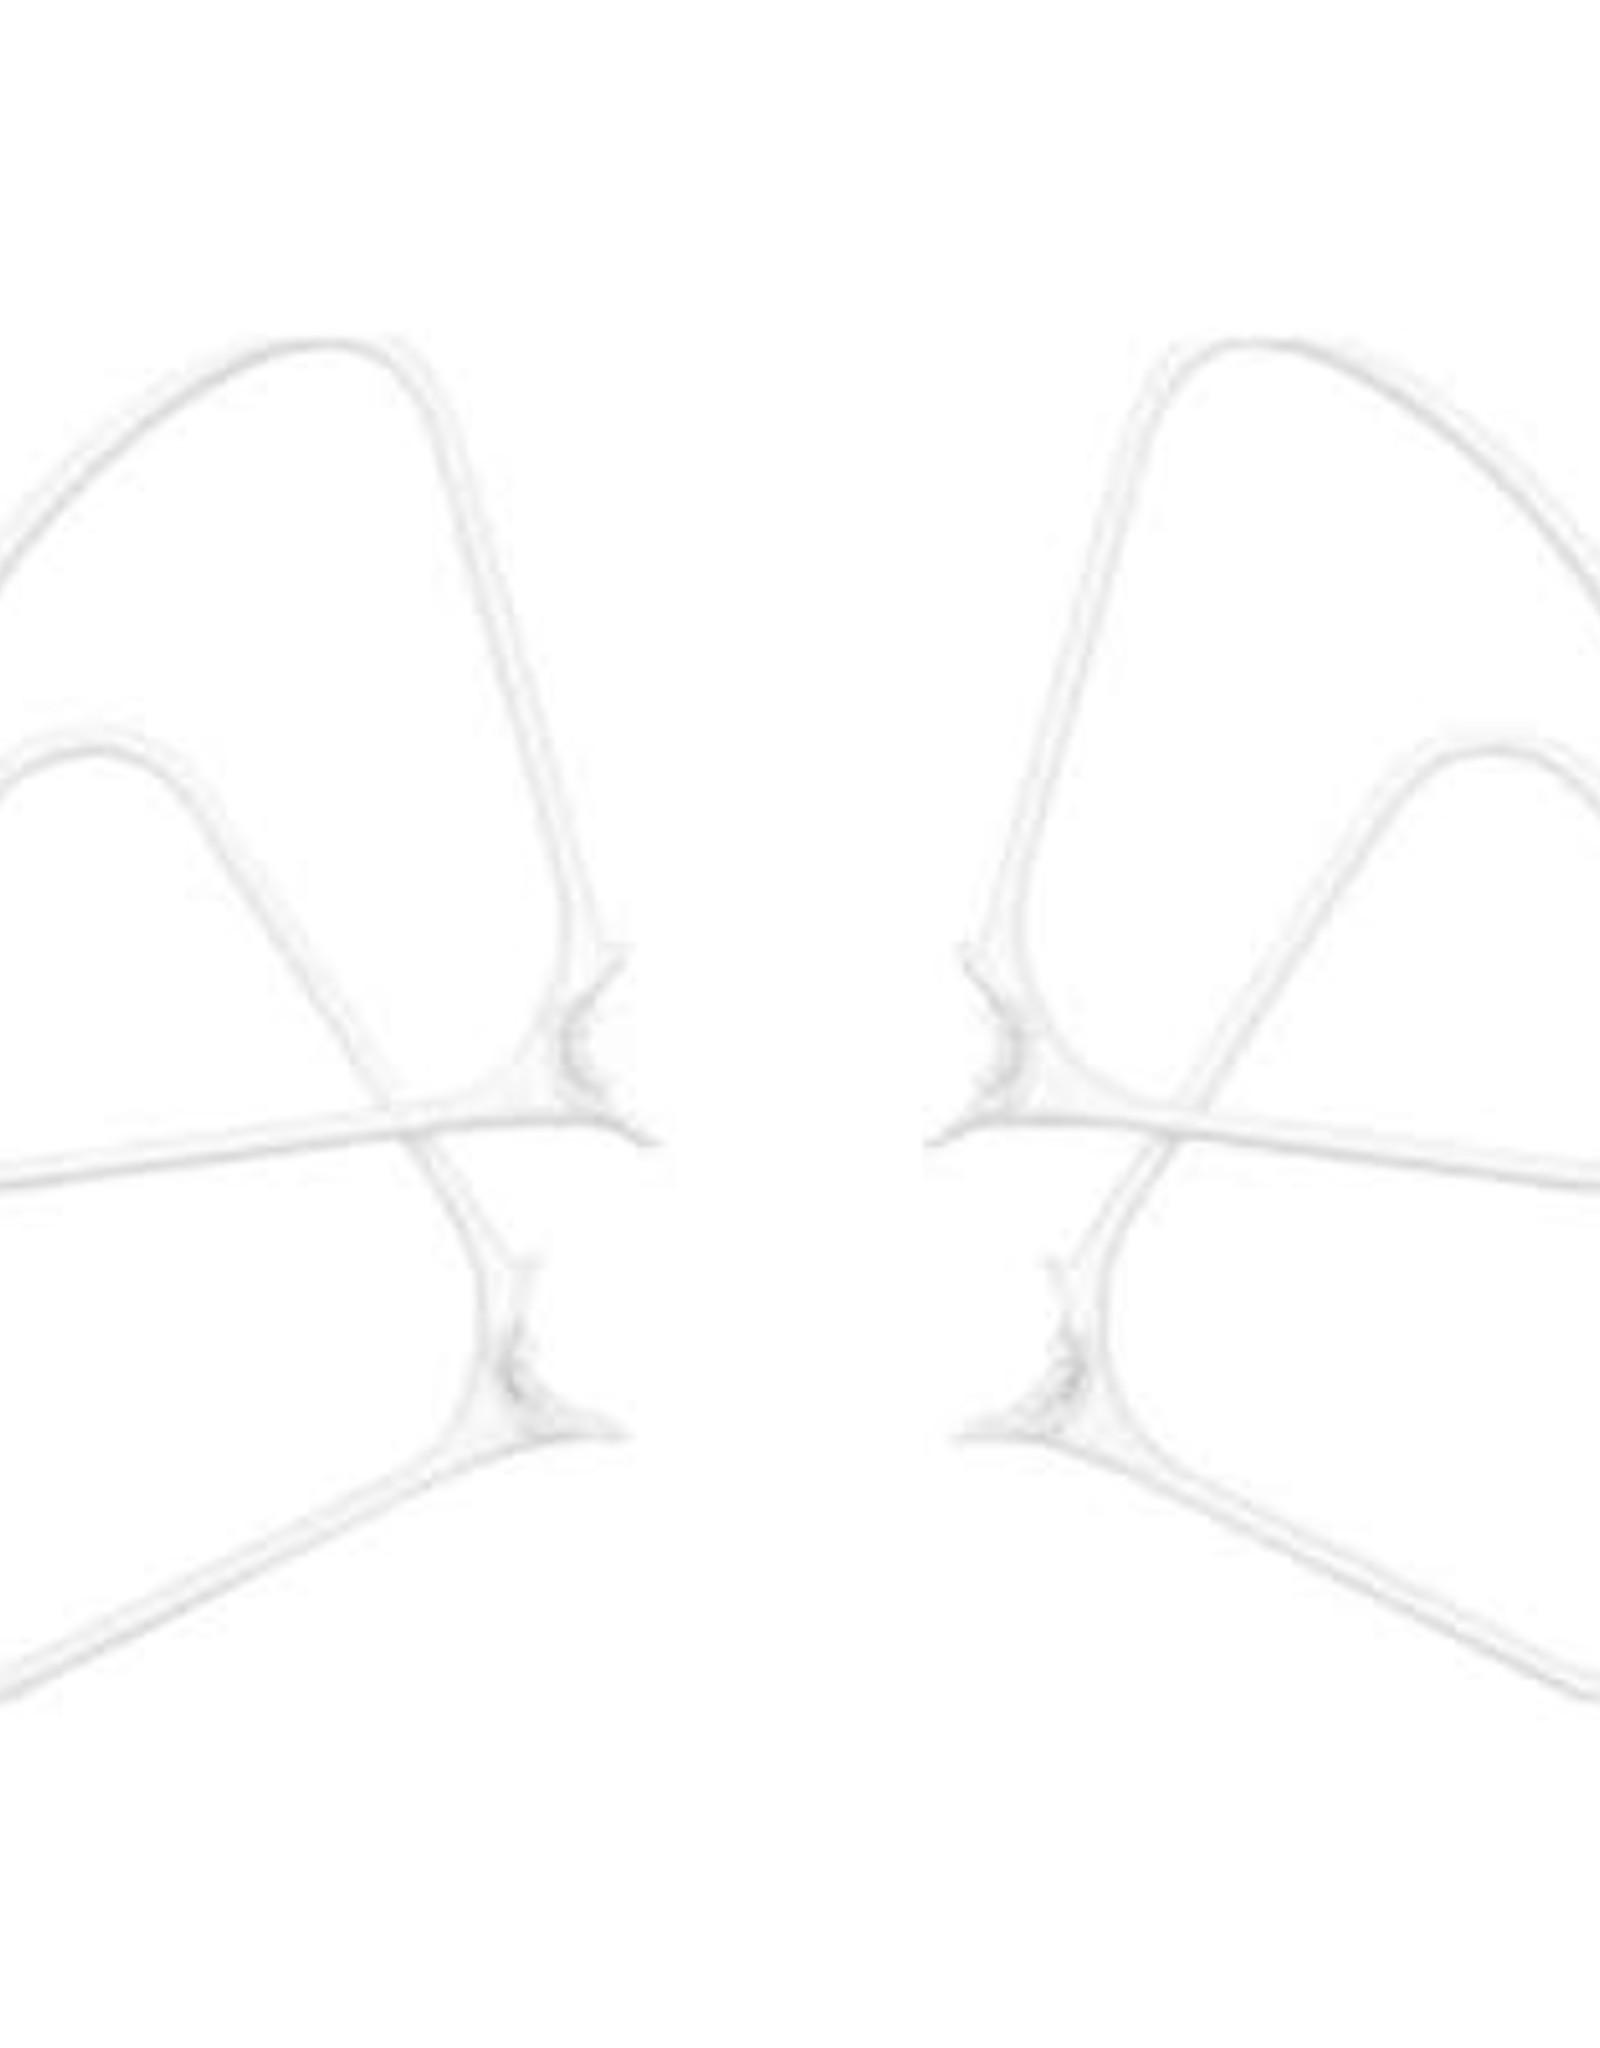 DJI DJI Accessory CP.PT.000599 Phantom 4 Part 62 Propeller Guards Retail